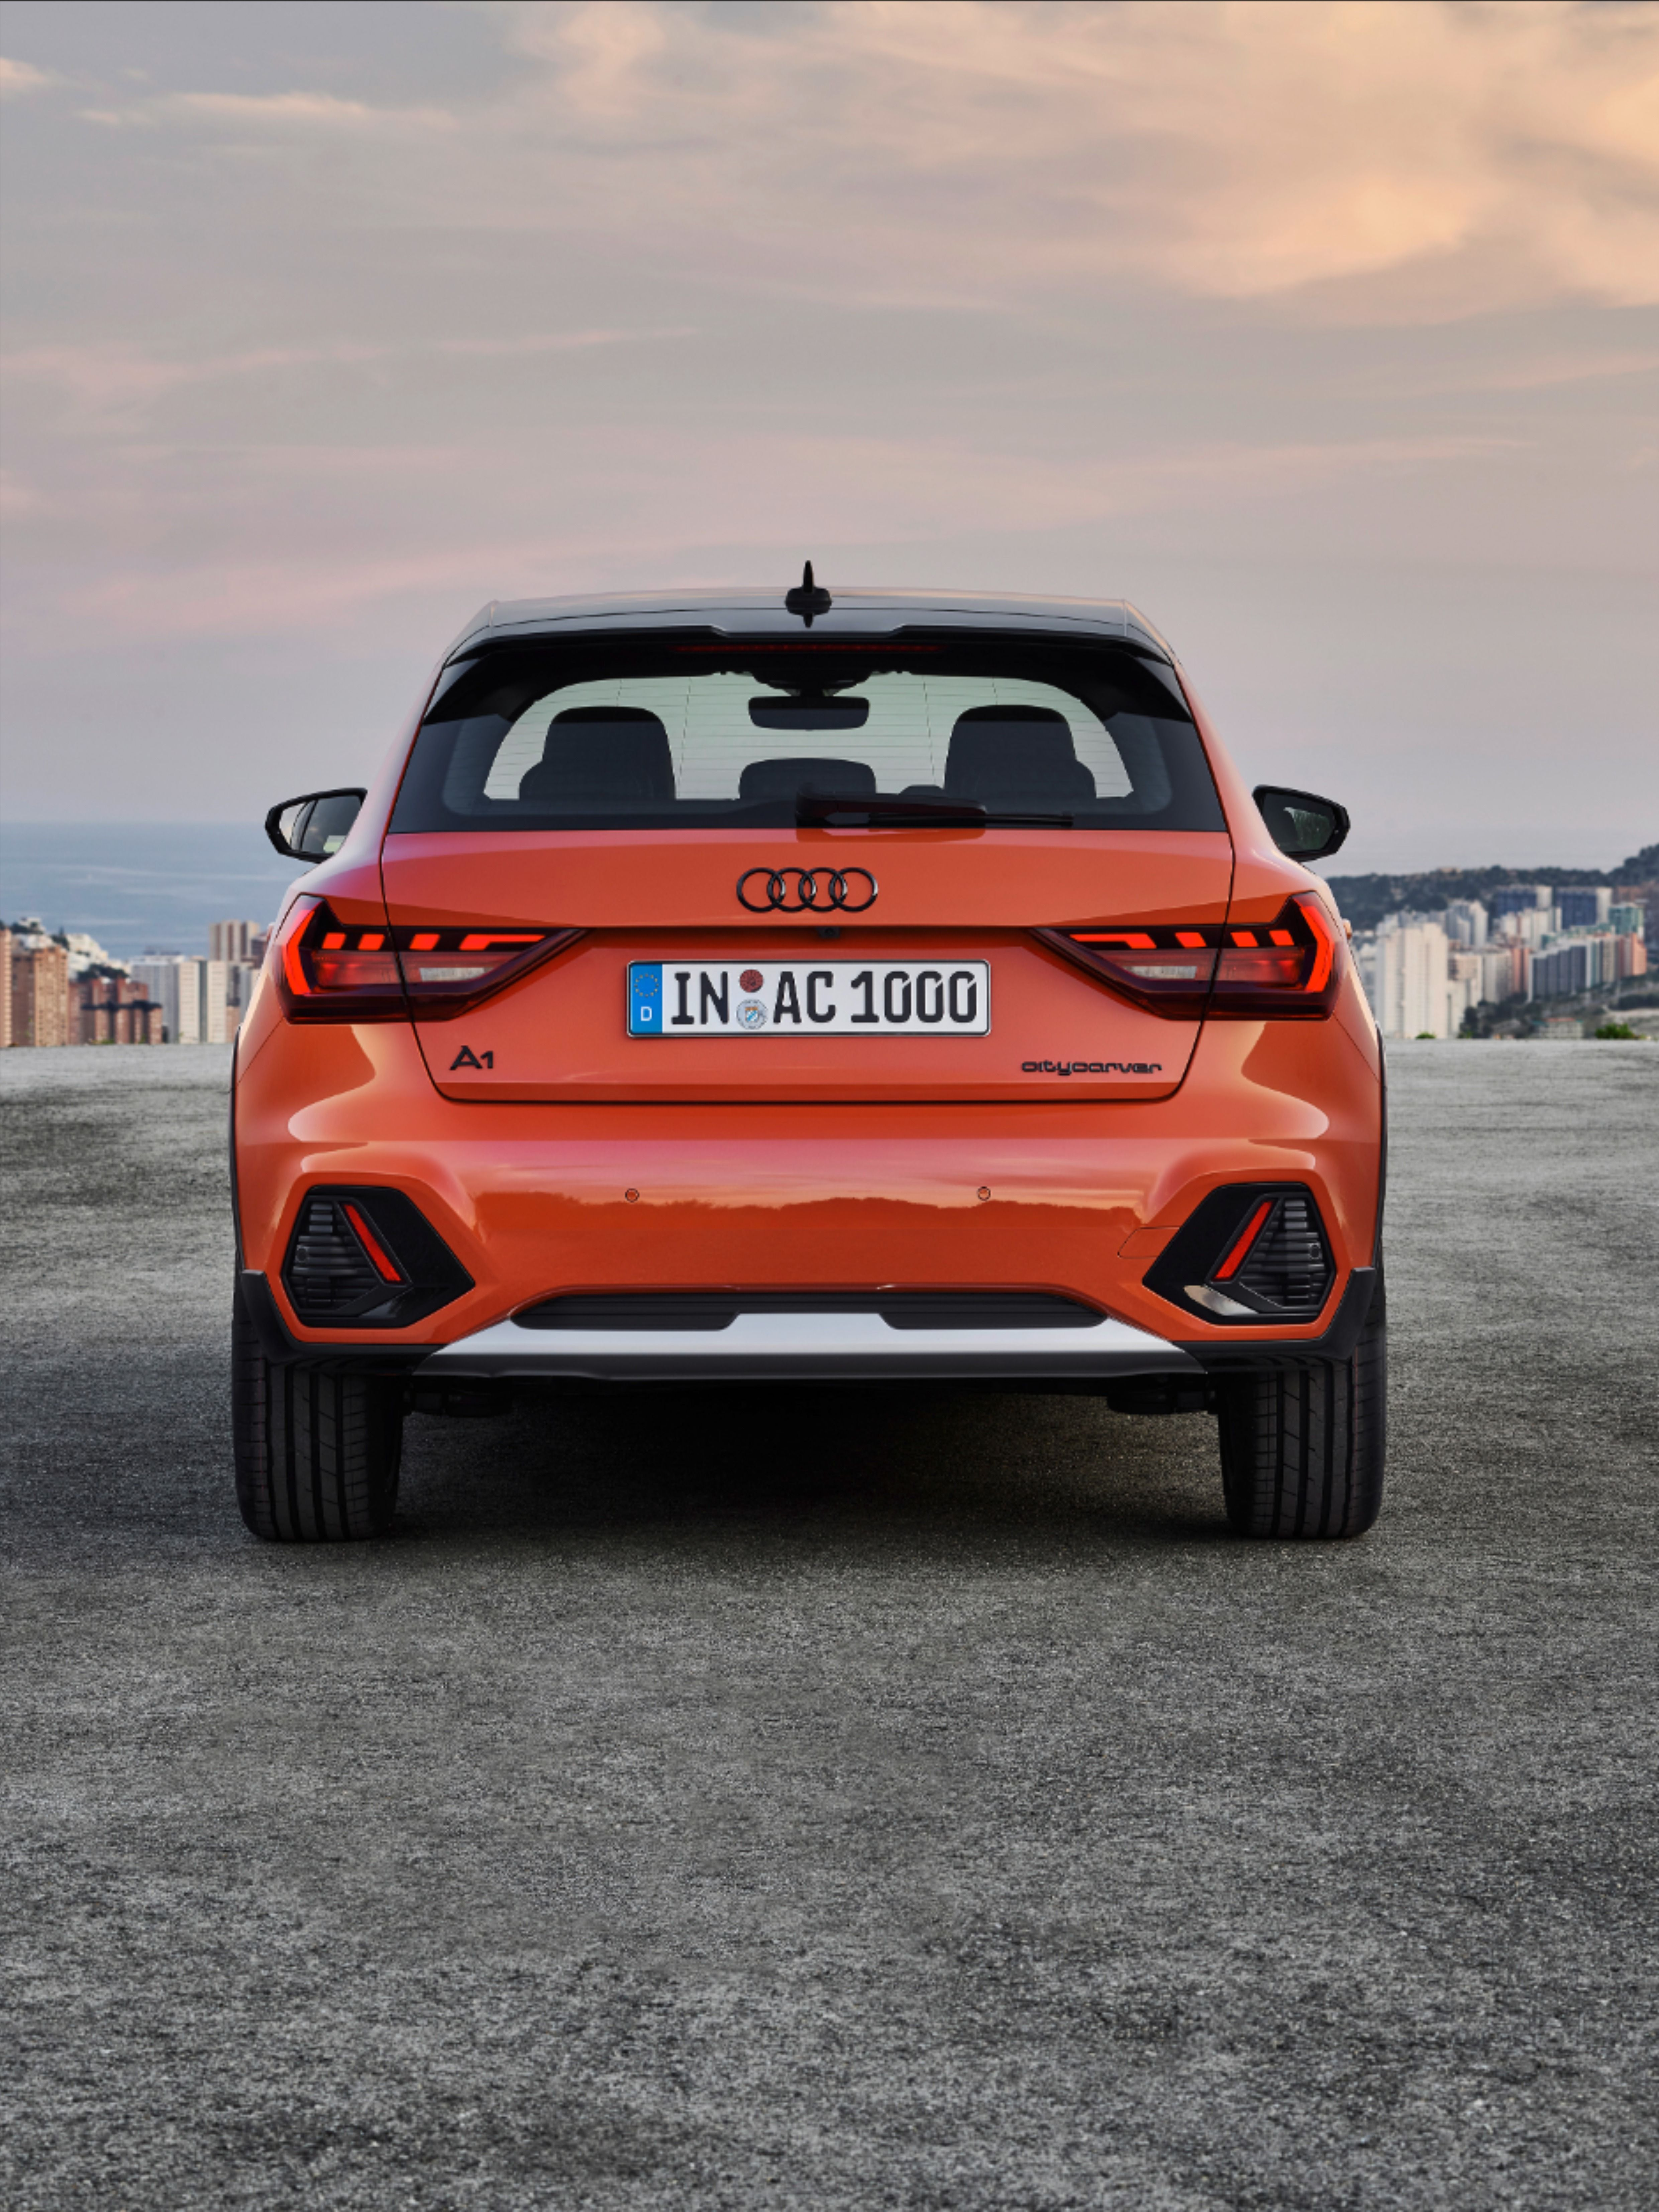 Audi A1 Audi A1 Orange Audi A1 2019 Audi A1 Citycarver